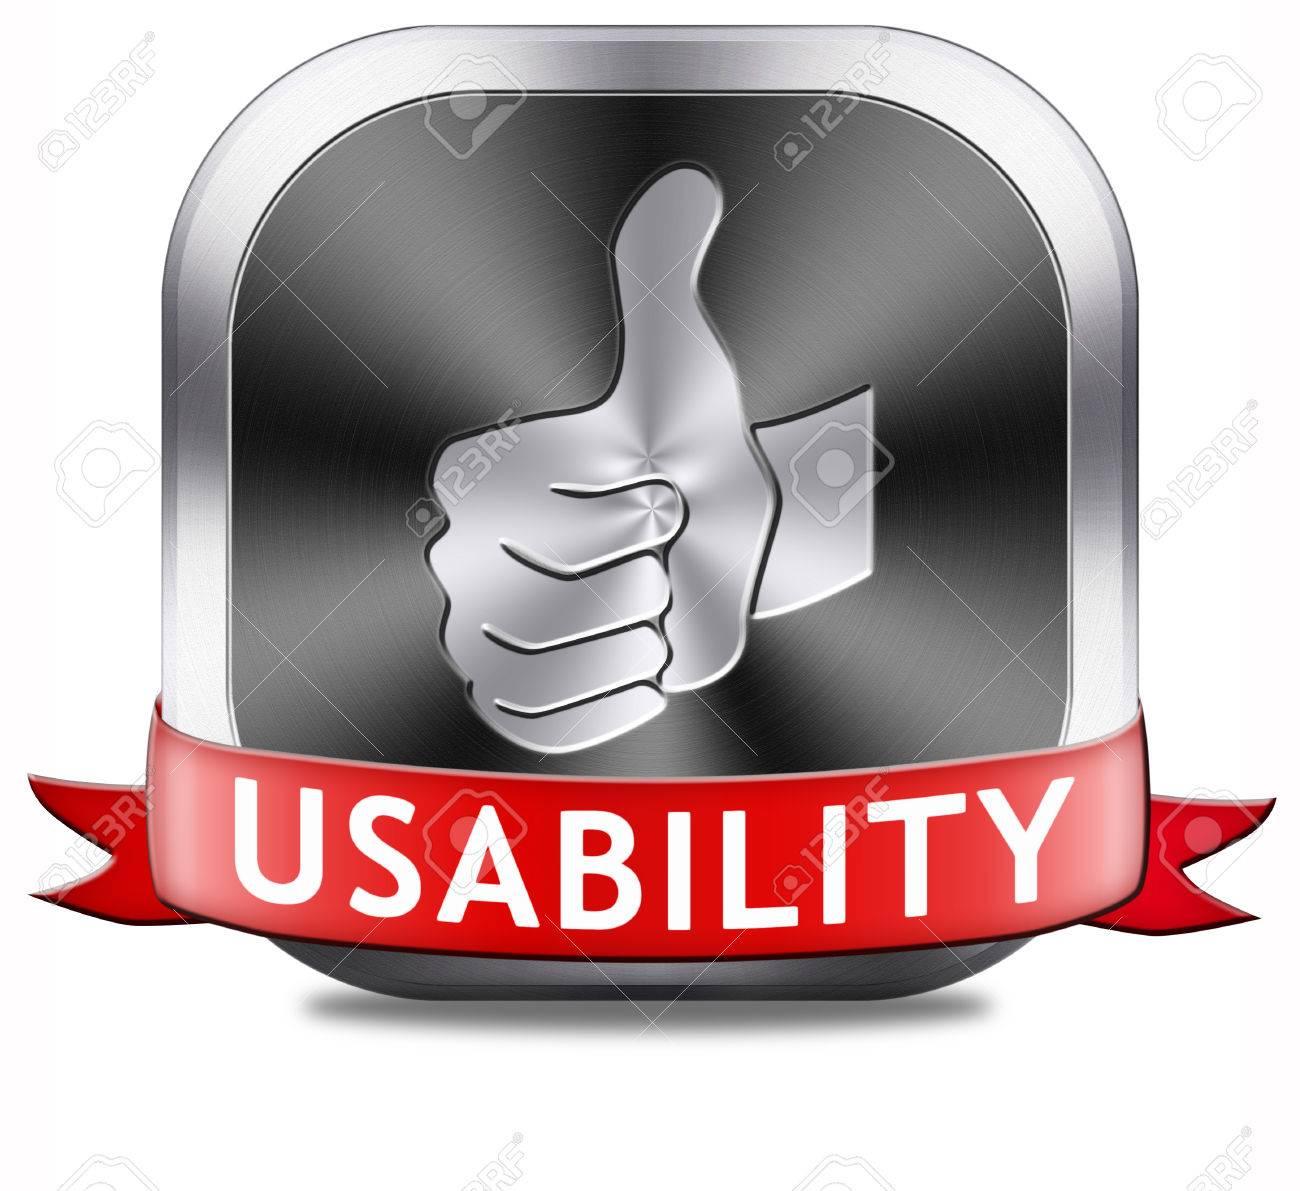 usability user friendly design and ergonomic internet or website stock photo usability user friendly design and ergonomic internet or website